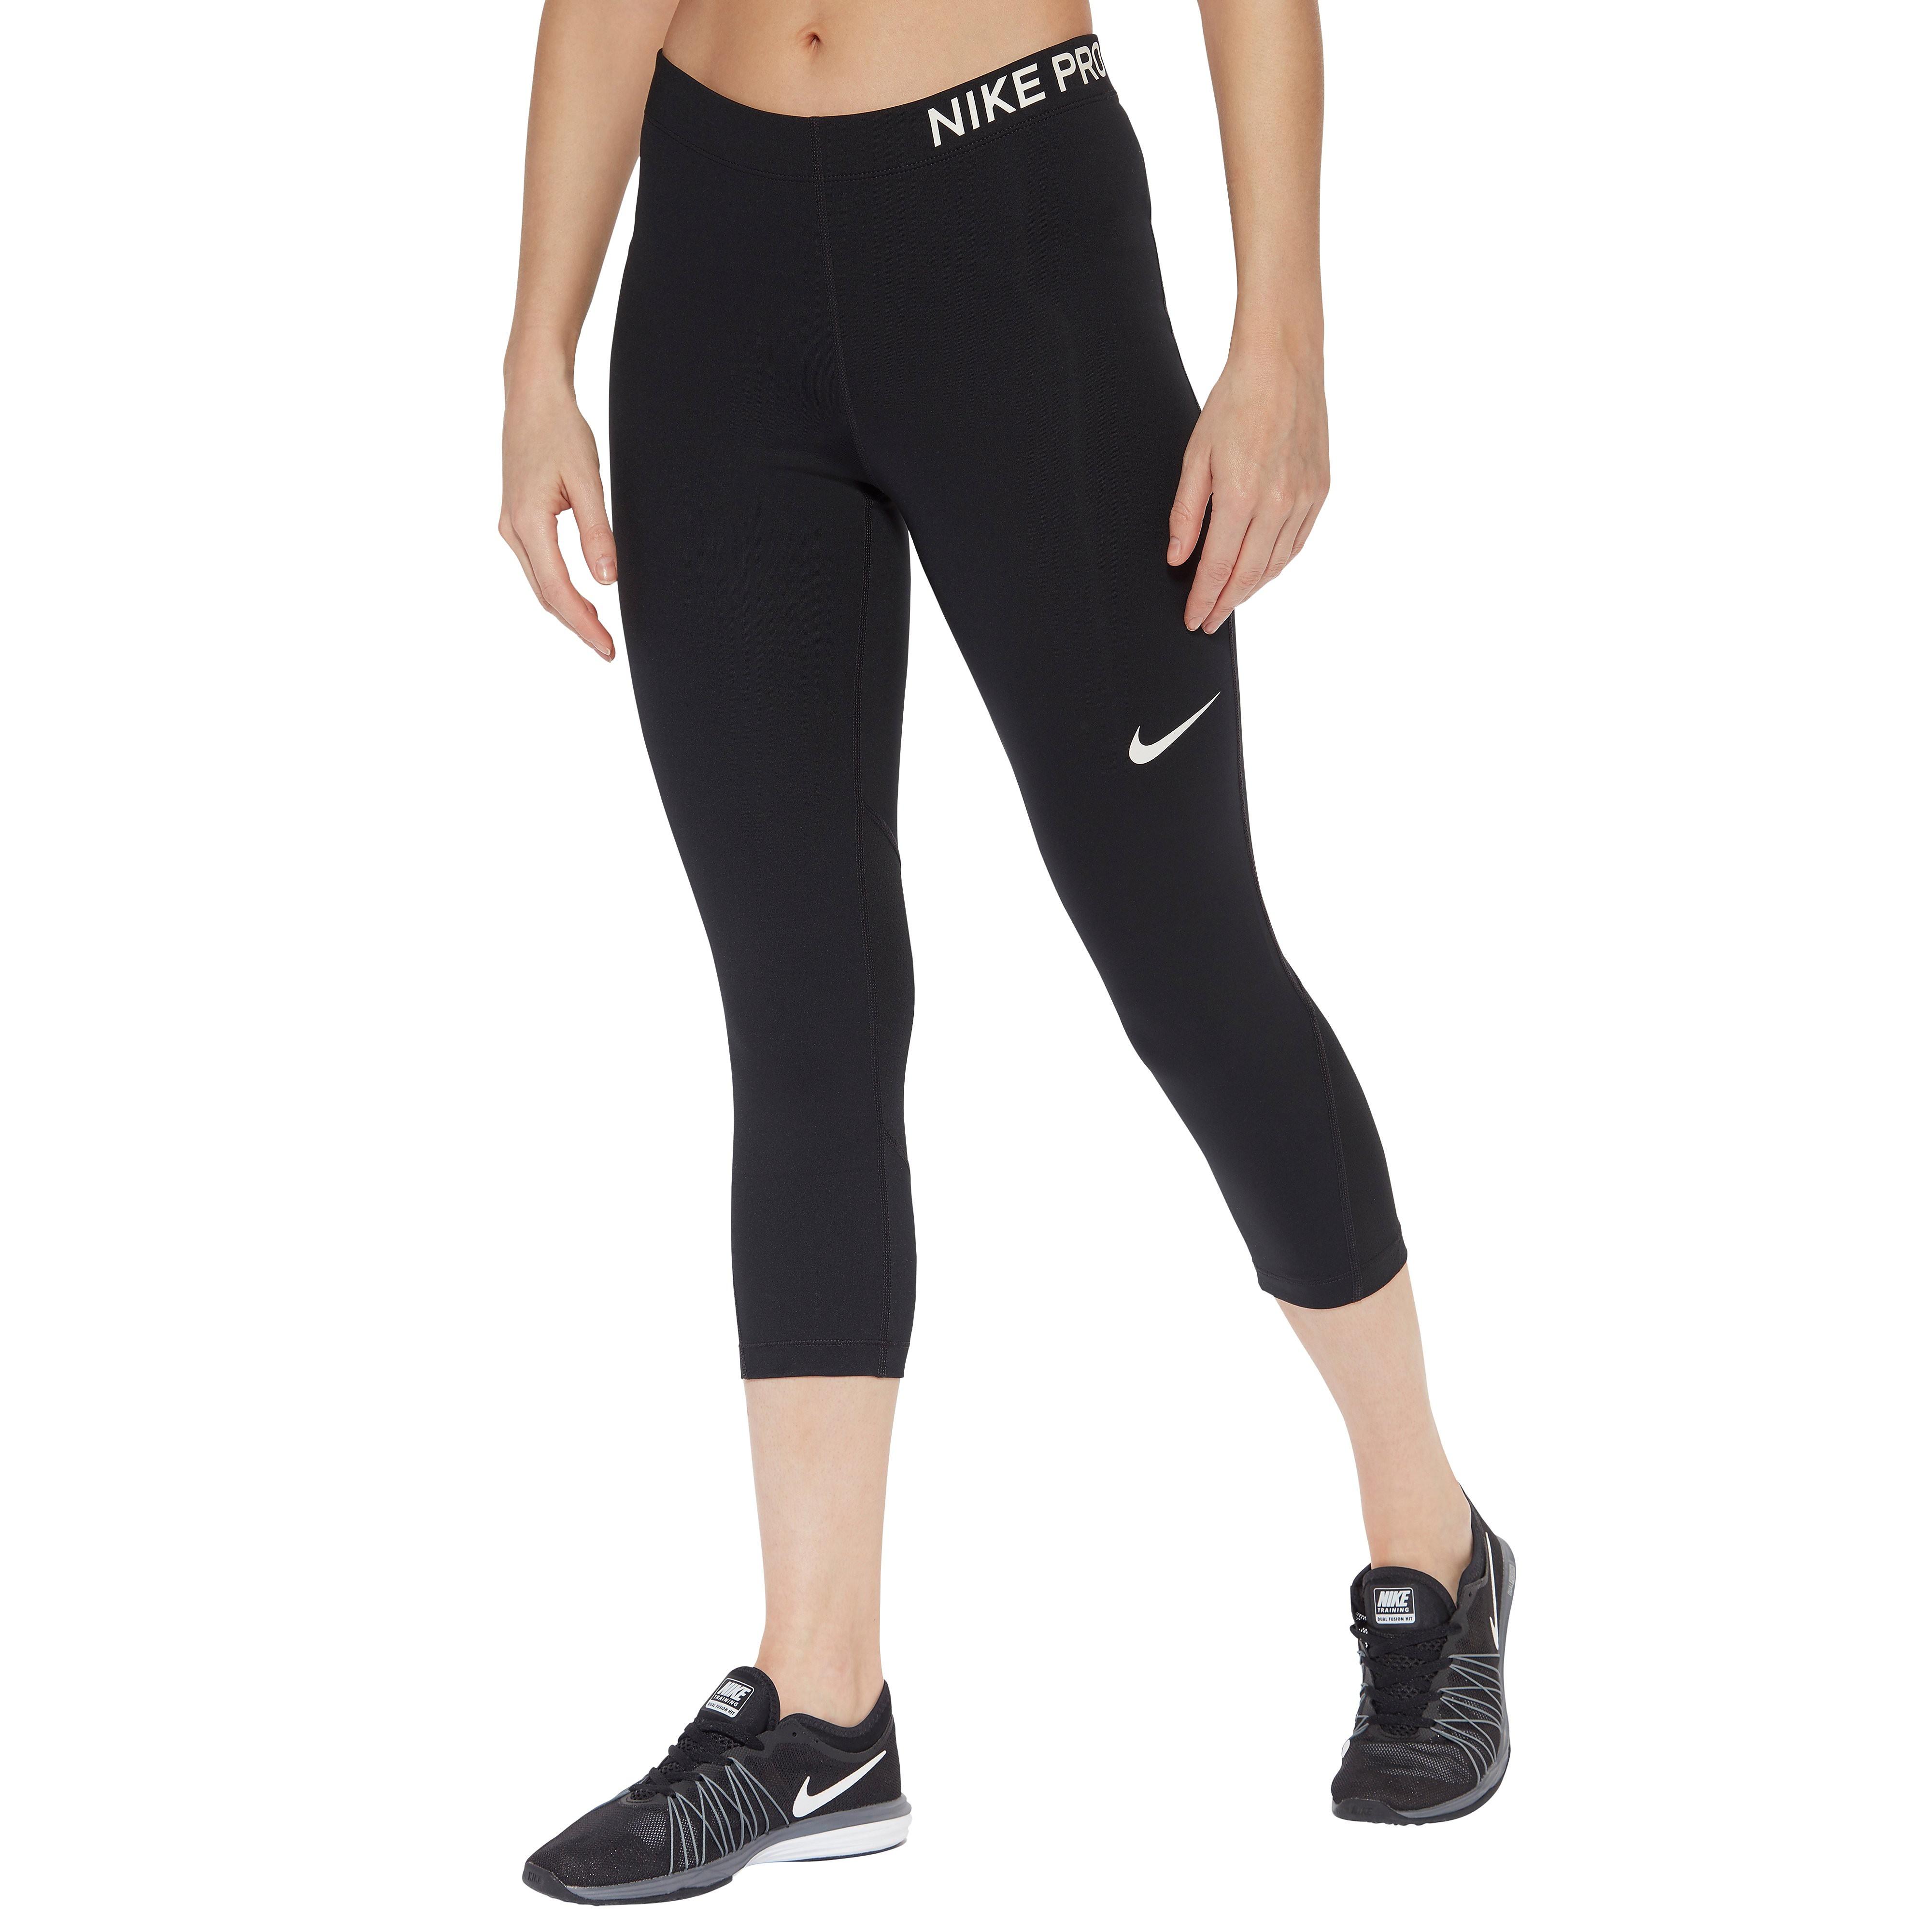 Nike Pro Capri Women's Training Leggings